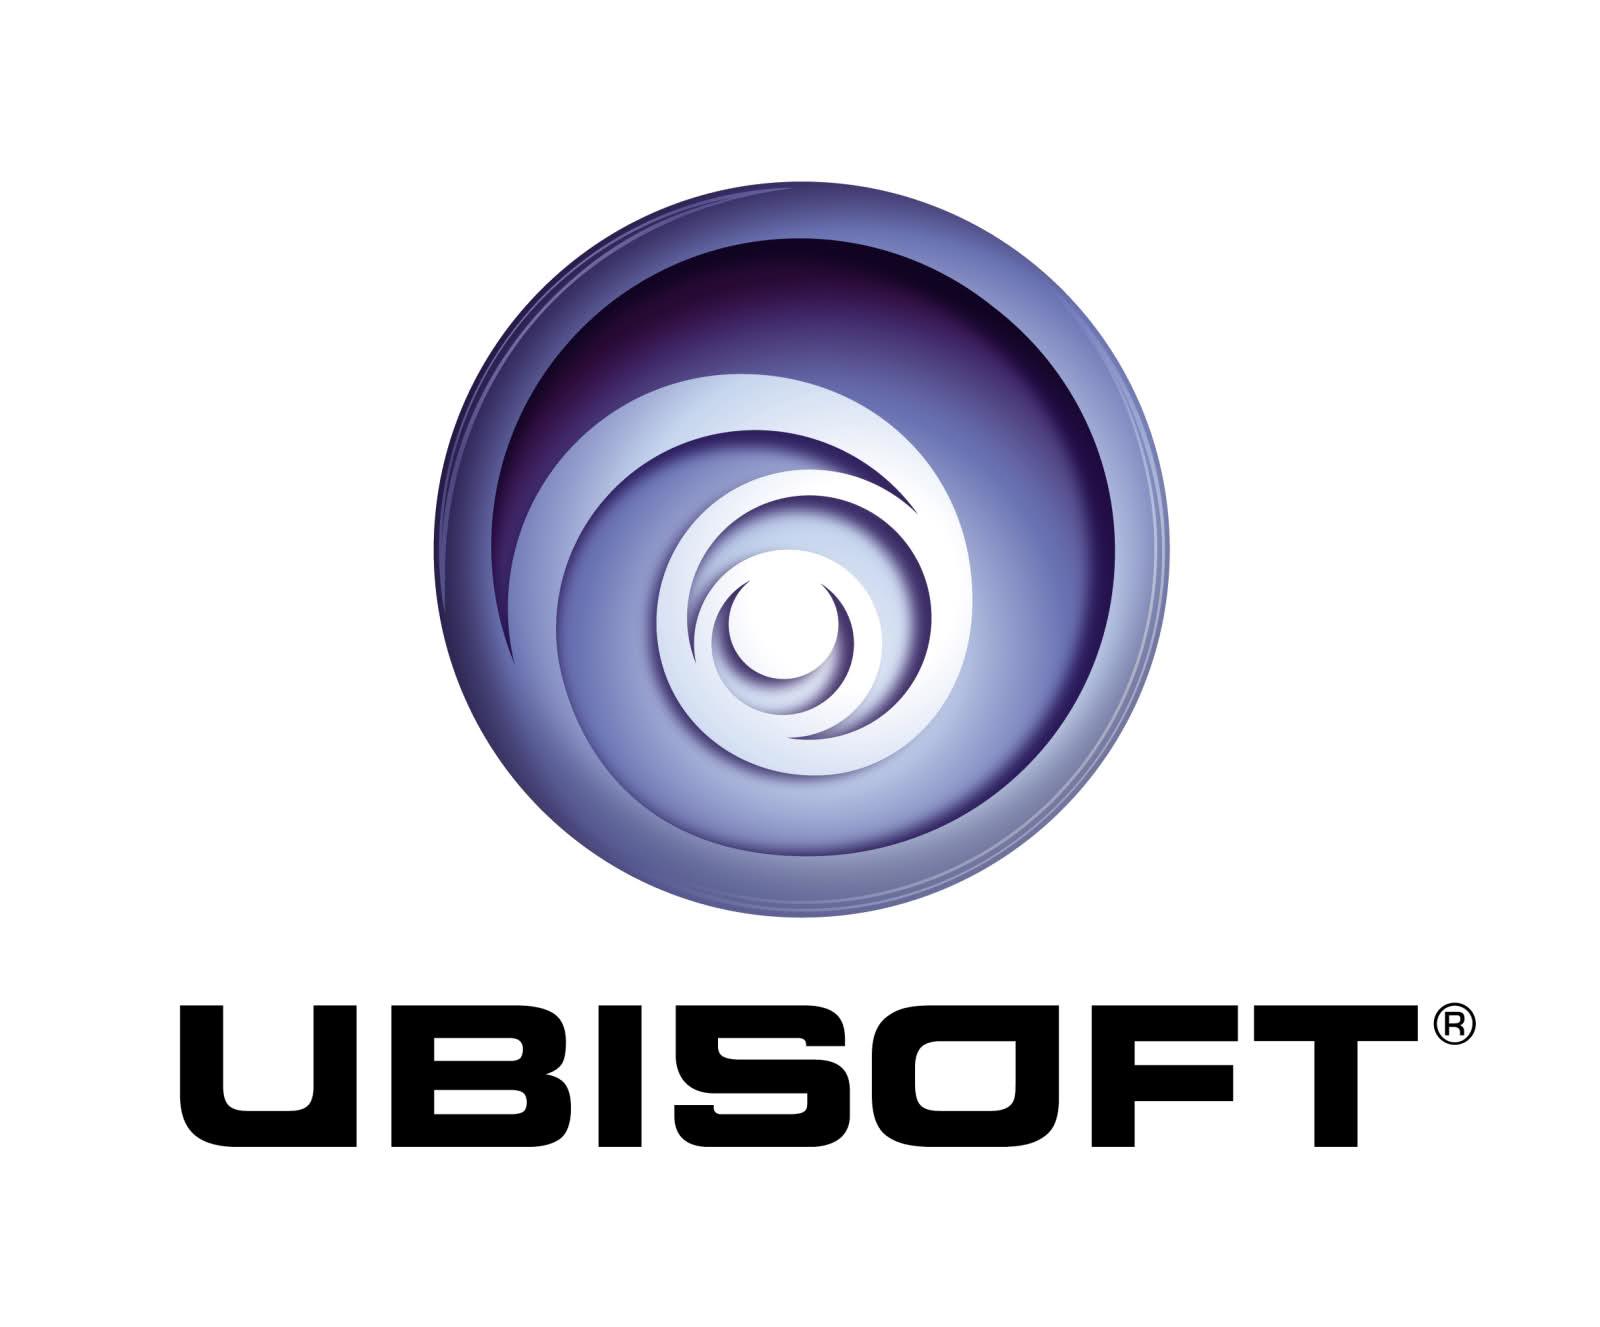 6814194-ubisoft-logo.jpg